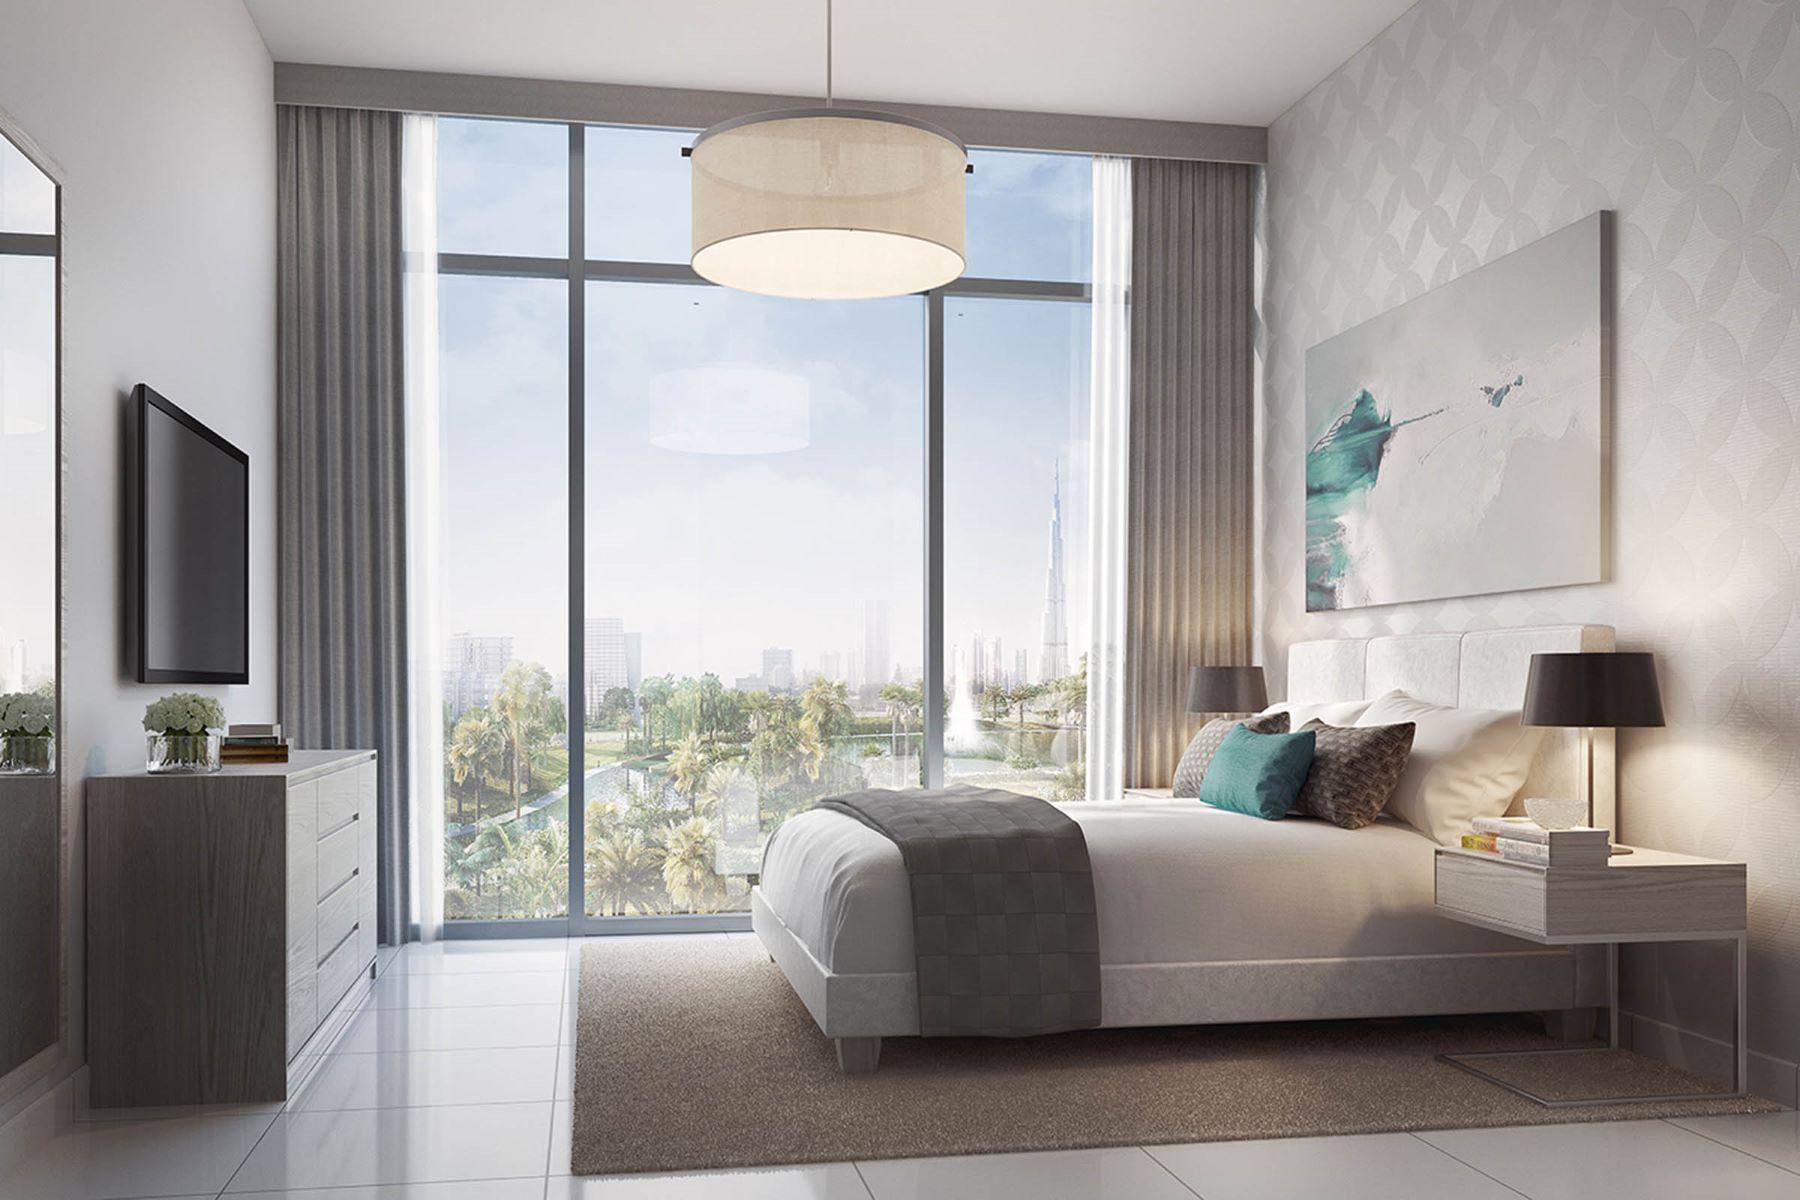 Apartment for Sale at Dubai Hills Estate Apartments by Emaar Other Dubai, Dubai United Arab Emirates